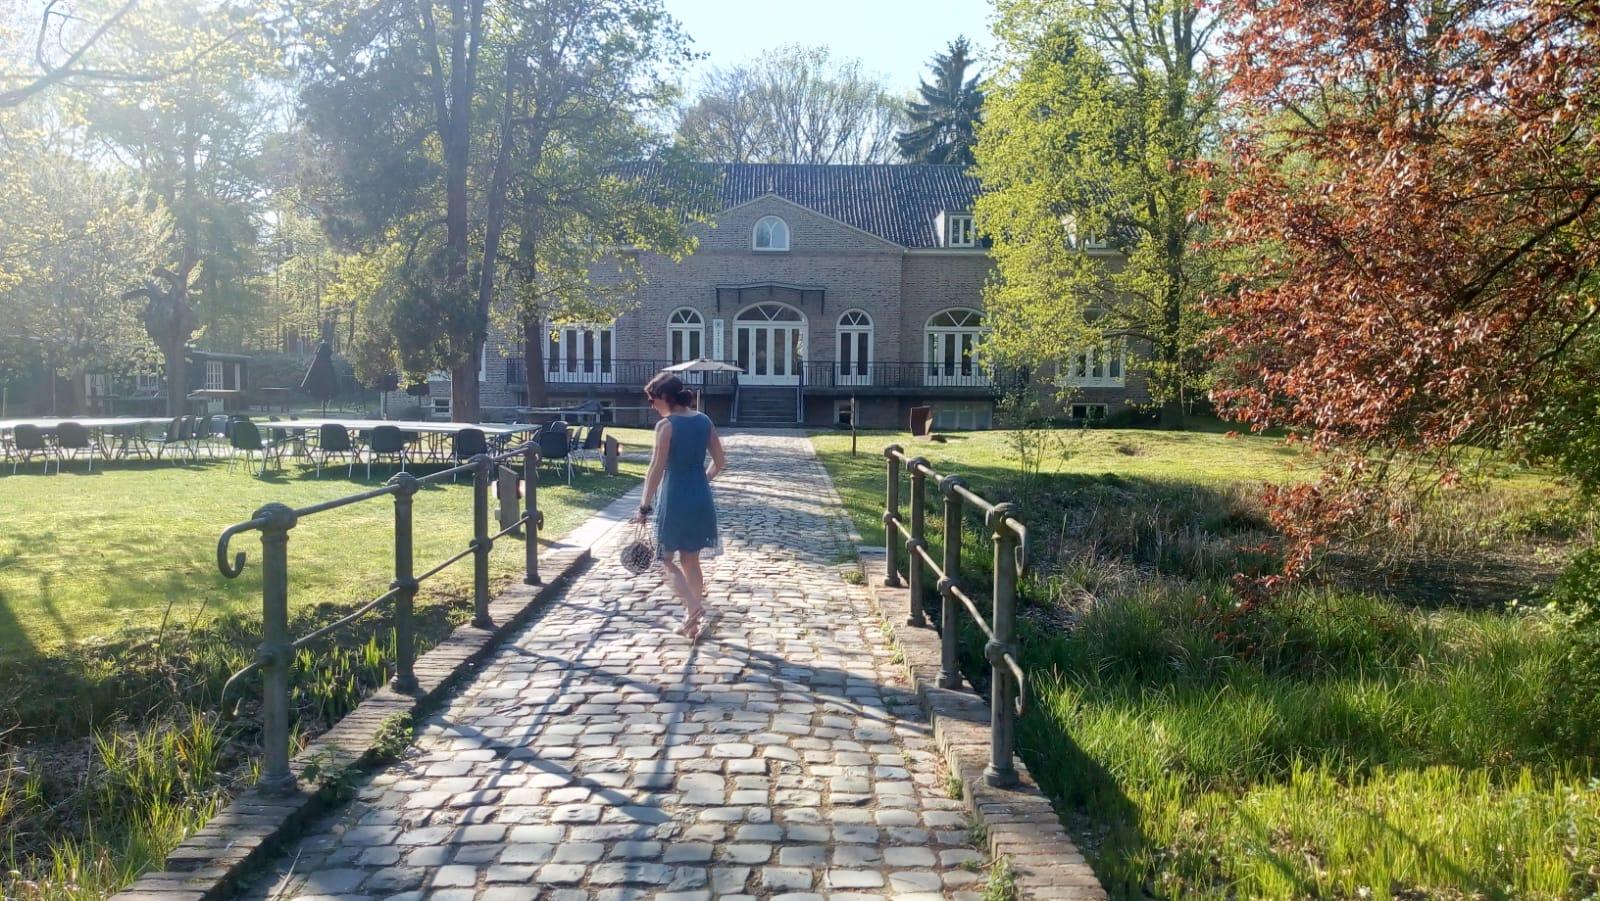 plog, kasteel, weekendje weg, kasteeltuinen, Limburg, Arcen, Chateau de Raay, kasteel Baarlo, hotel Baarlo, mamablog, mamalifestyle, blog, lalogblog, lalog, lalog.nl